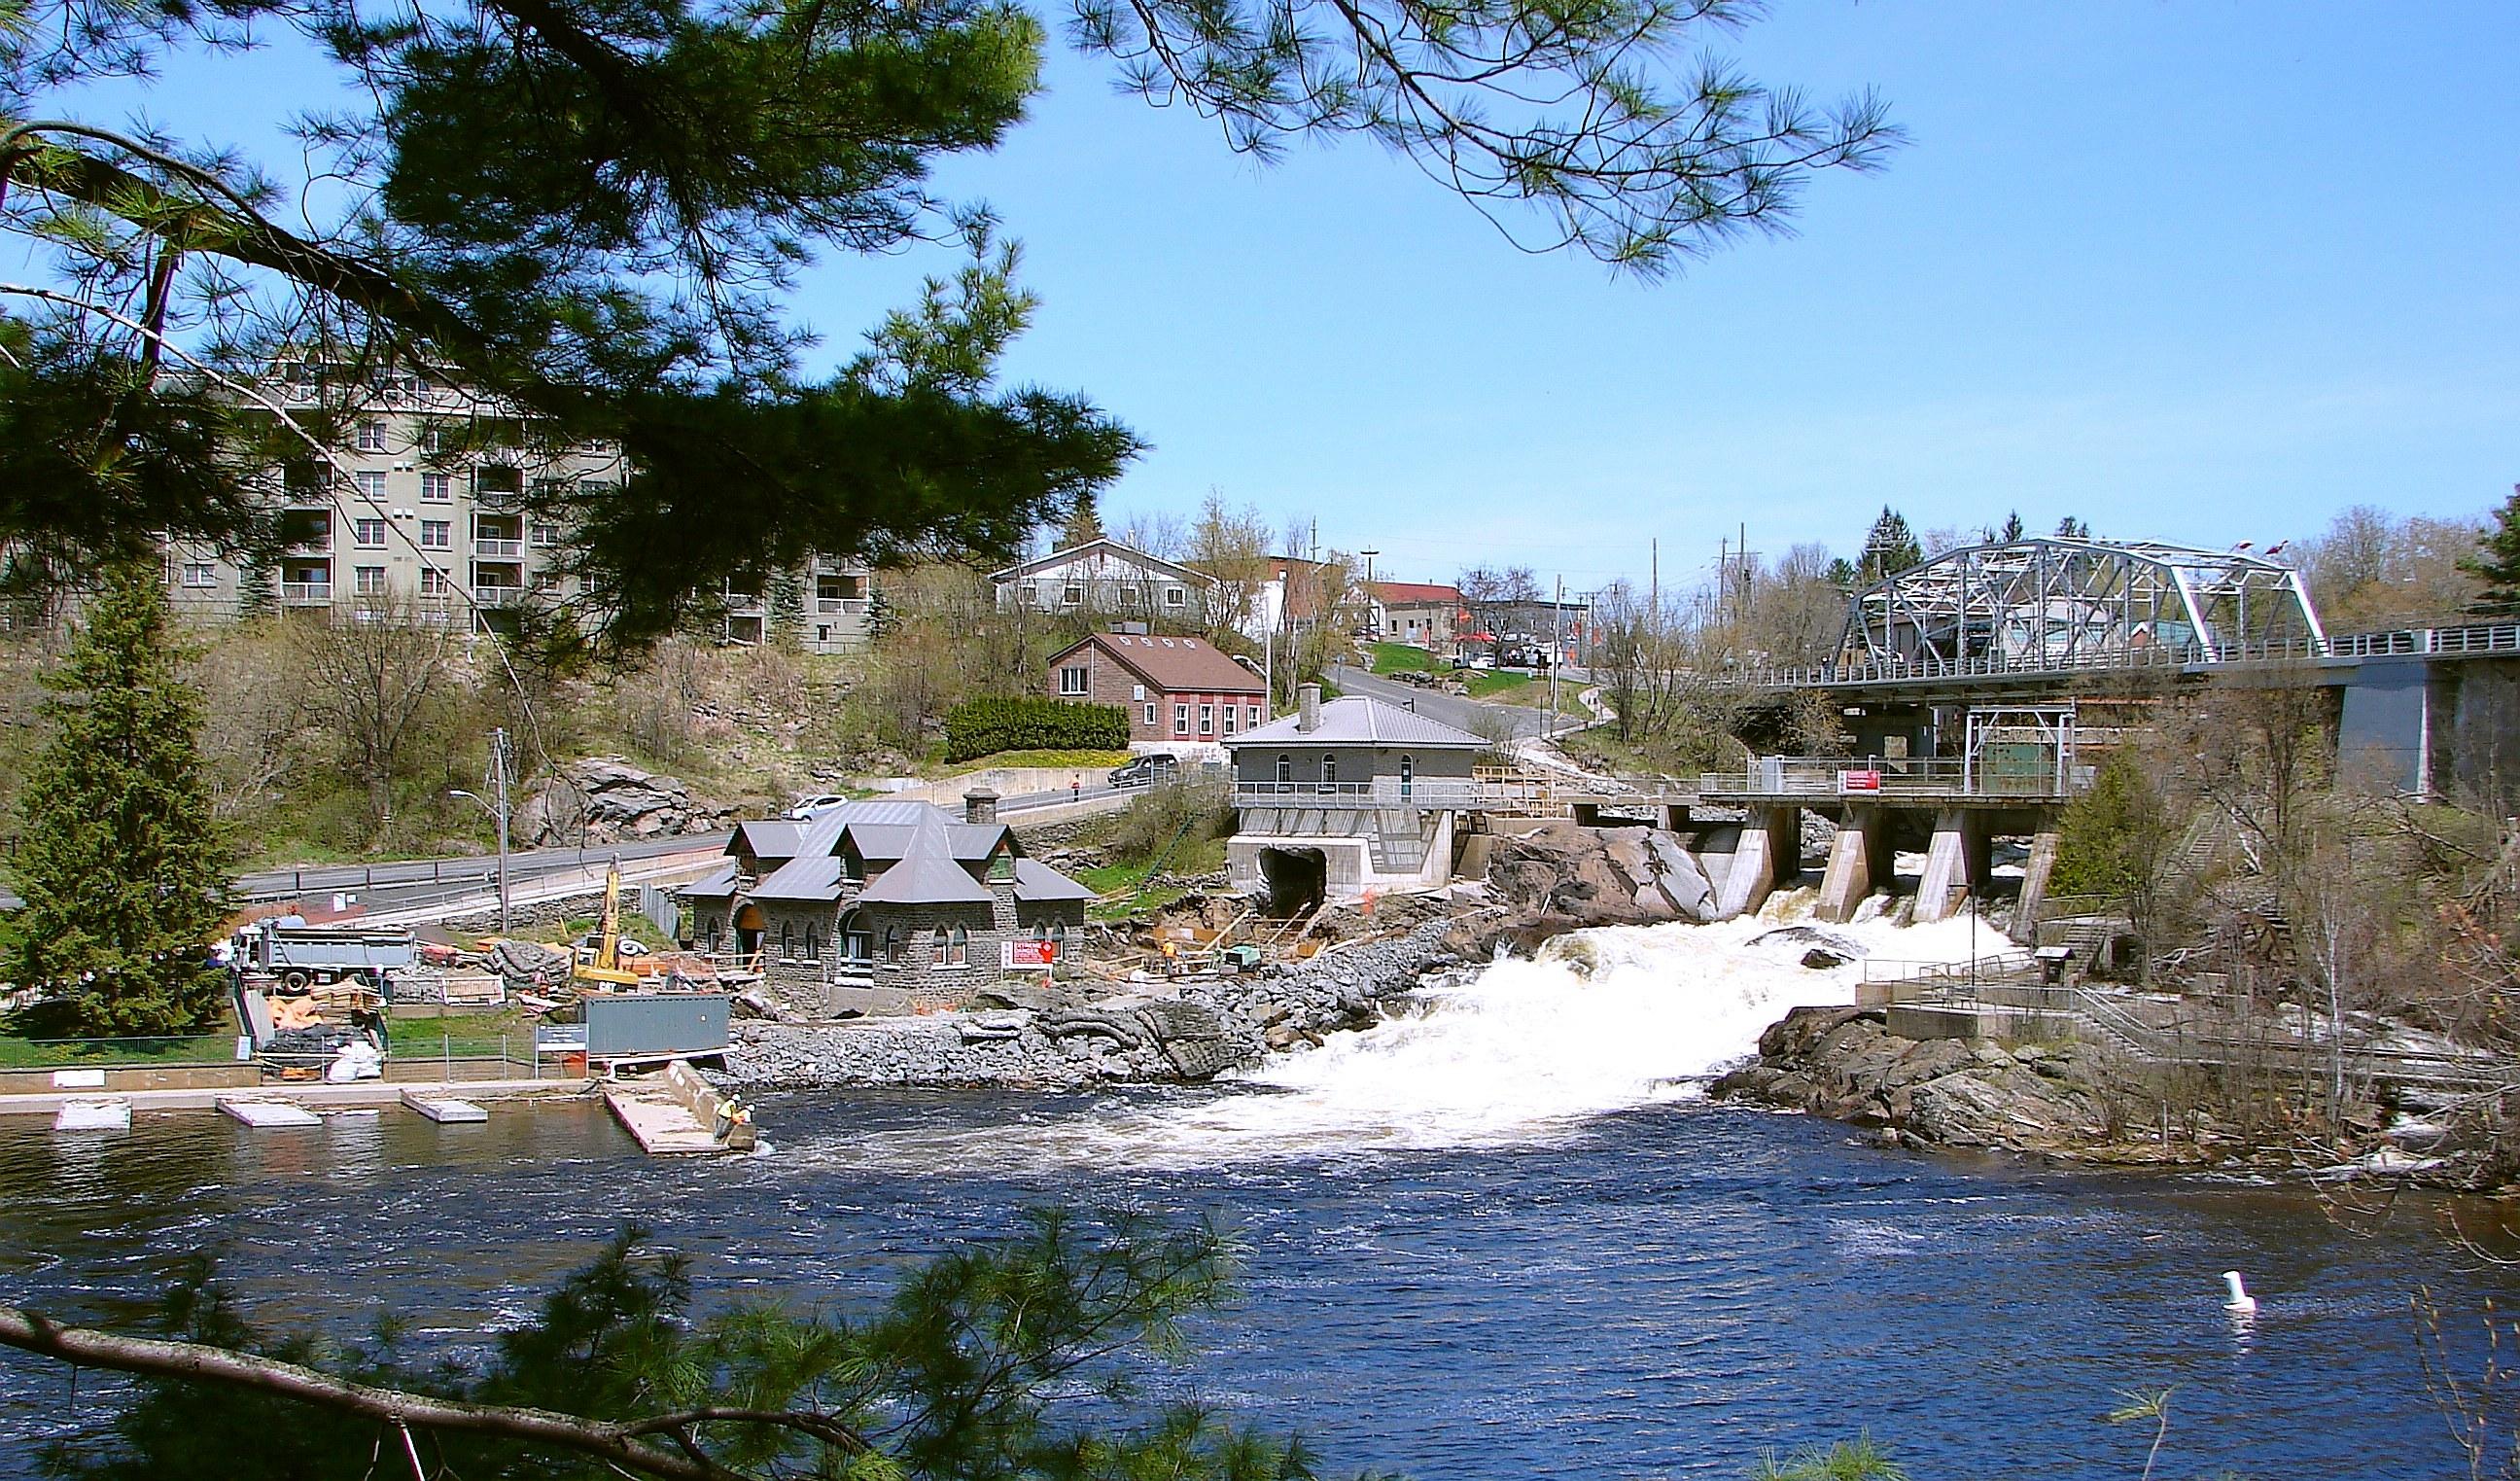 Bracebridge (ON) Canada  city pictures gallery : Bracebridge ON Wikipedia, the free encyclopedia